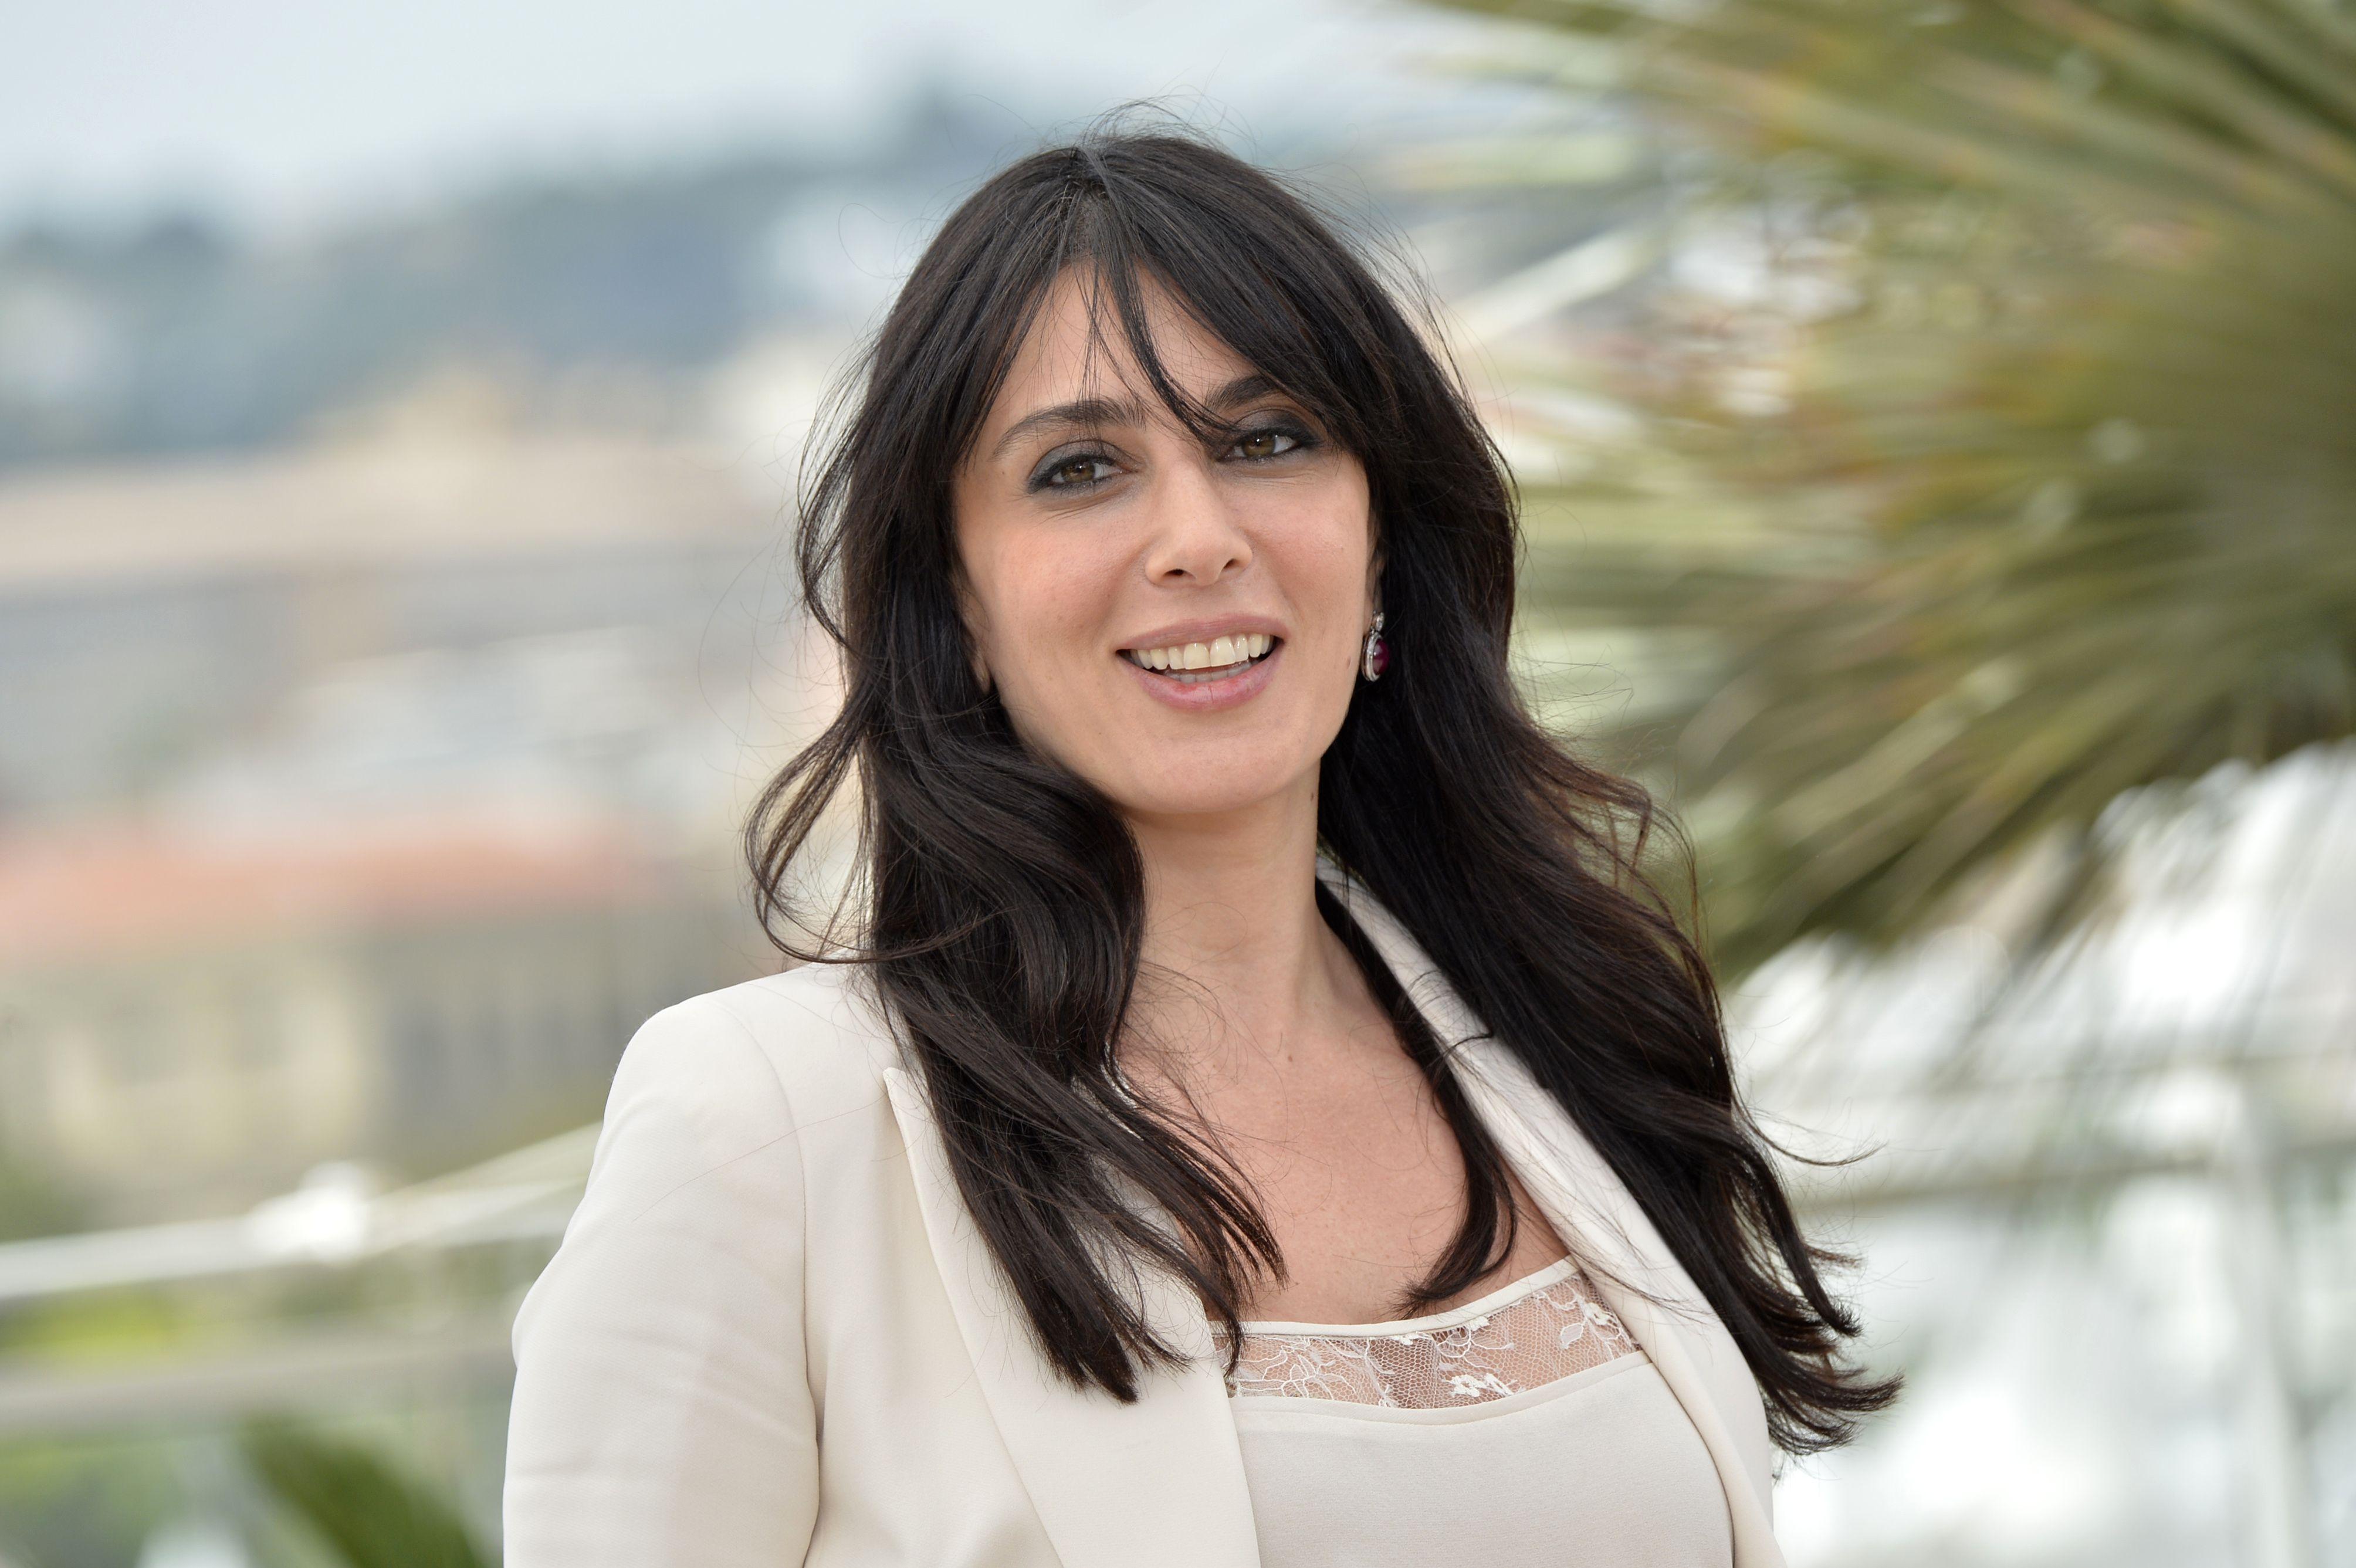 Nadine LabakiUn Certain Regard Jury Photocall, 68th Cannes Film Festival, France - 14 May 2015